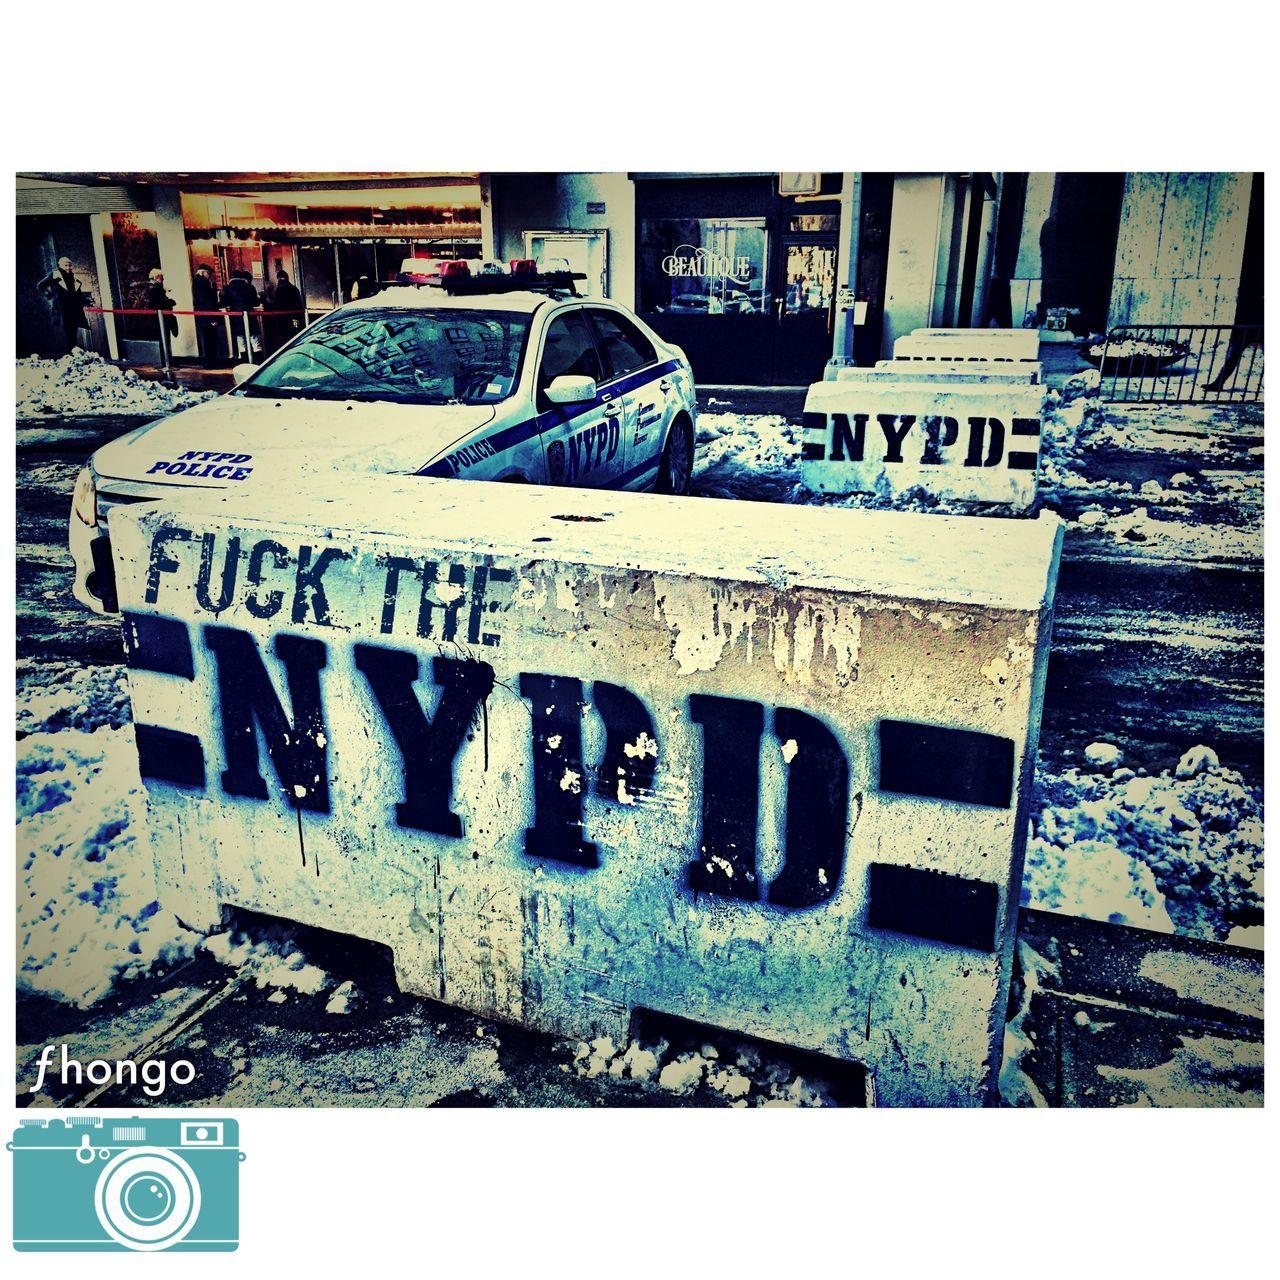 FUCK YOU NYPD Police NYC Photography Streetphotography Newyorkcity New York Newyork Blizzard CentralPark